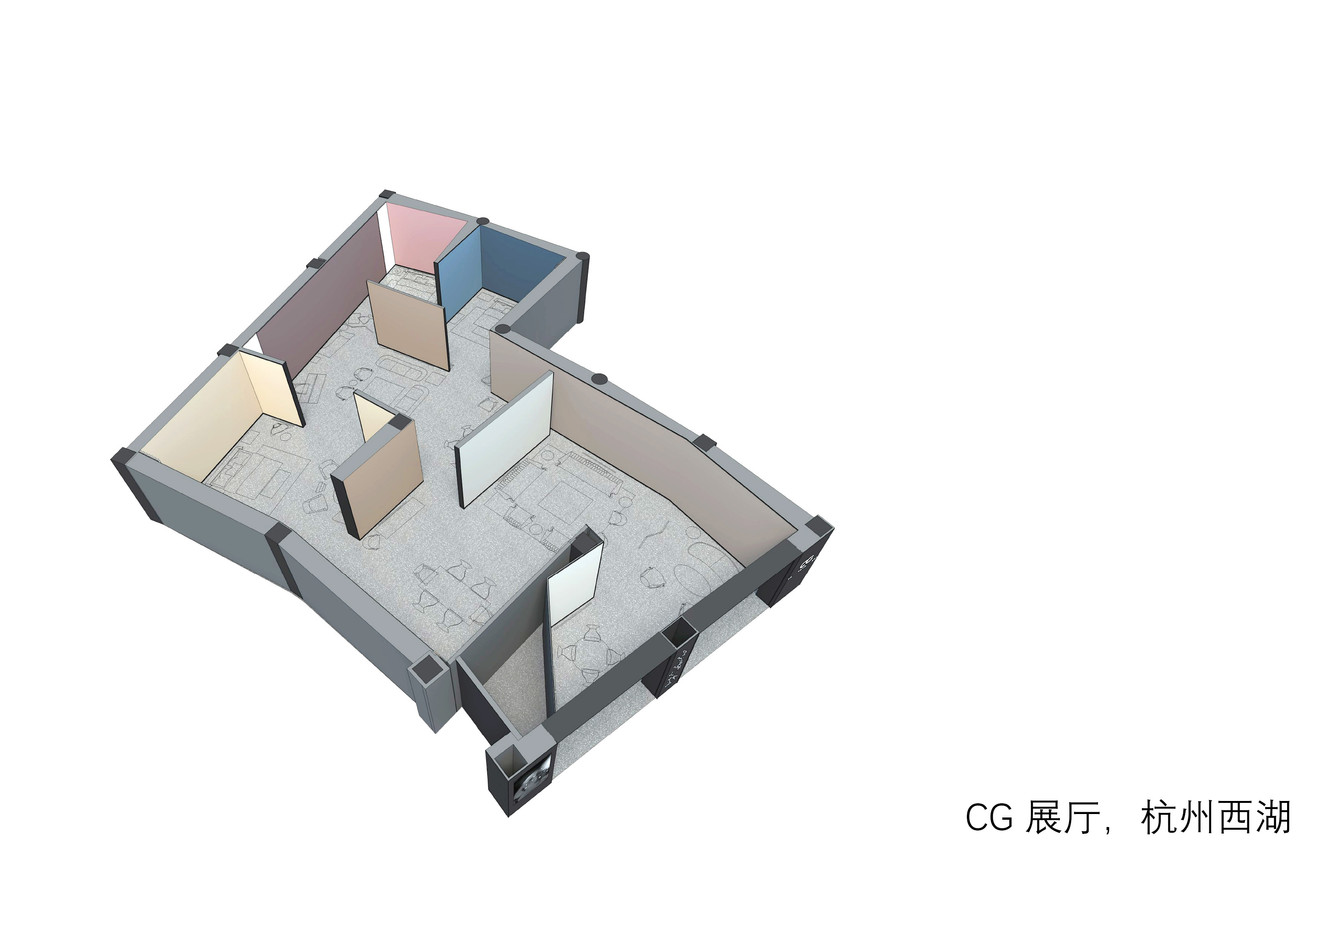 CG-FURNITURE-GALLERY3-ZH.jpg